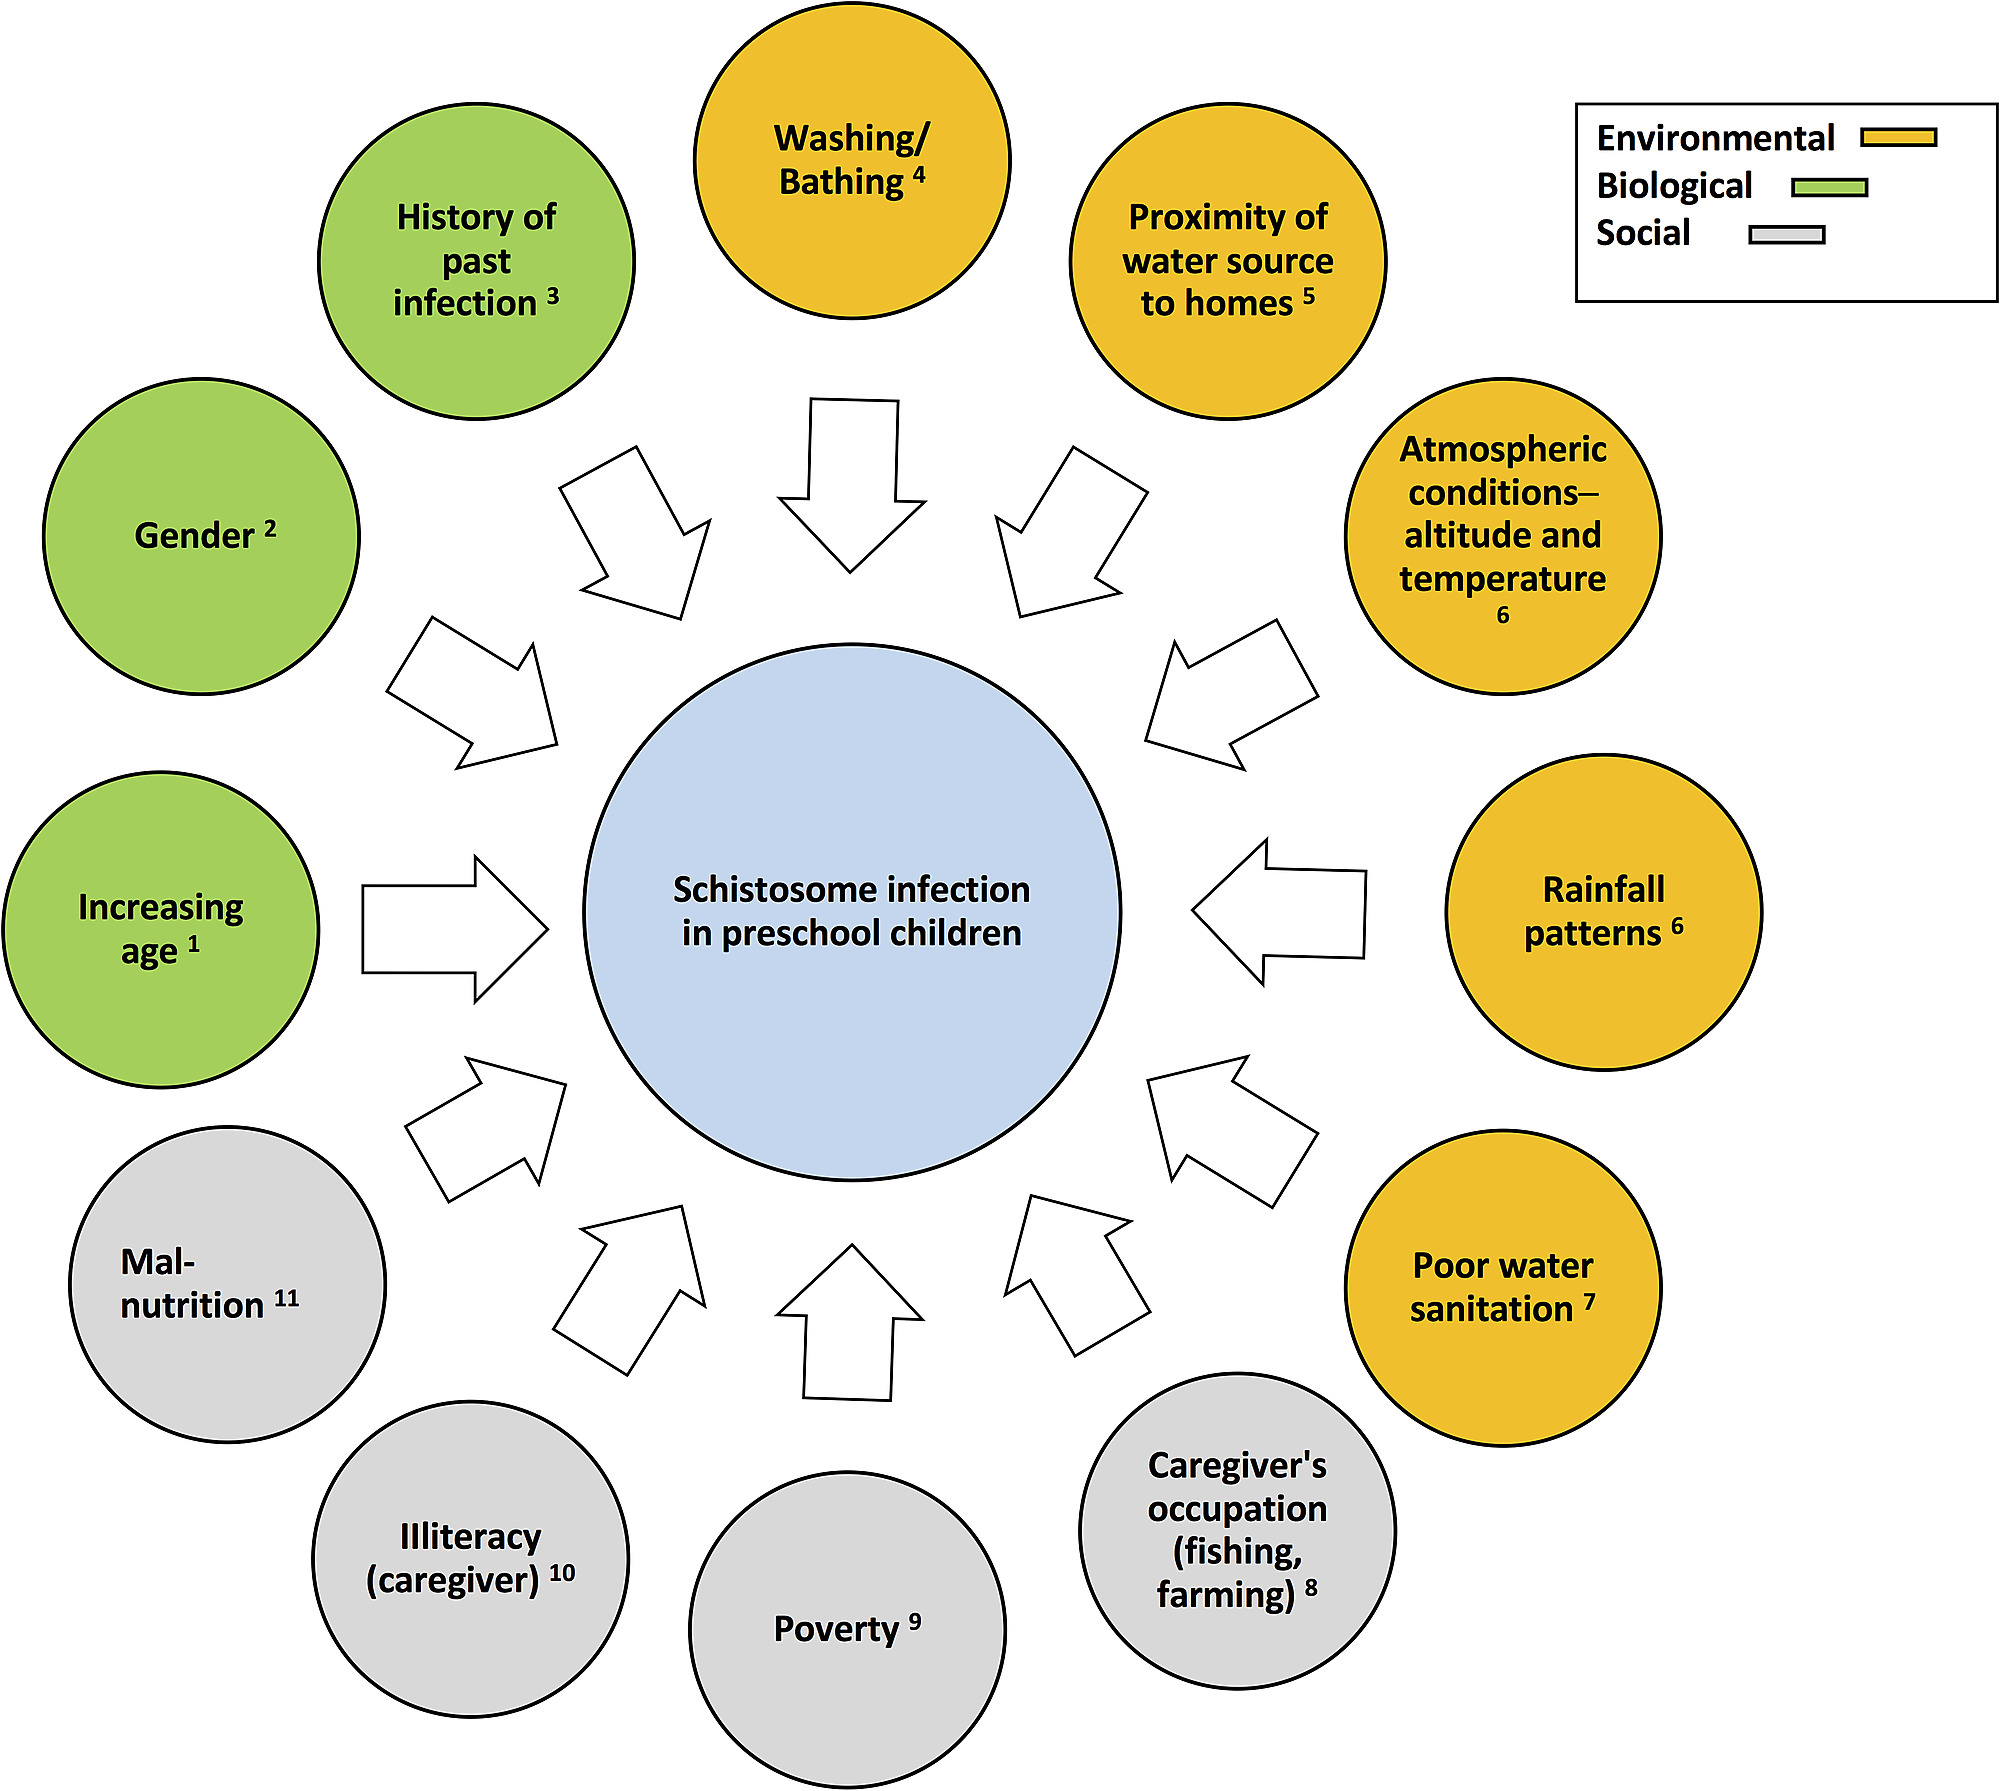 cancer sarcoma ewing human papillomaviruses abbreviation